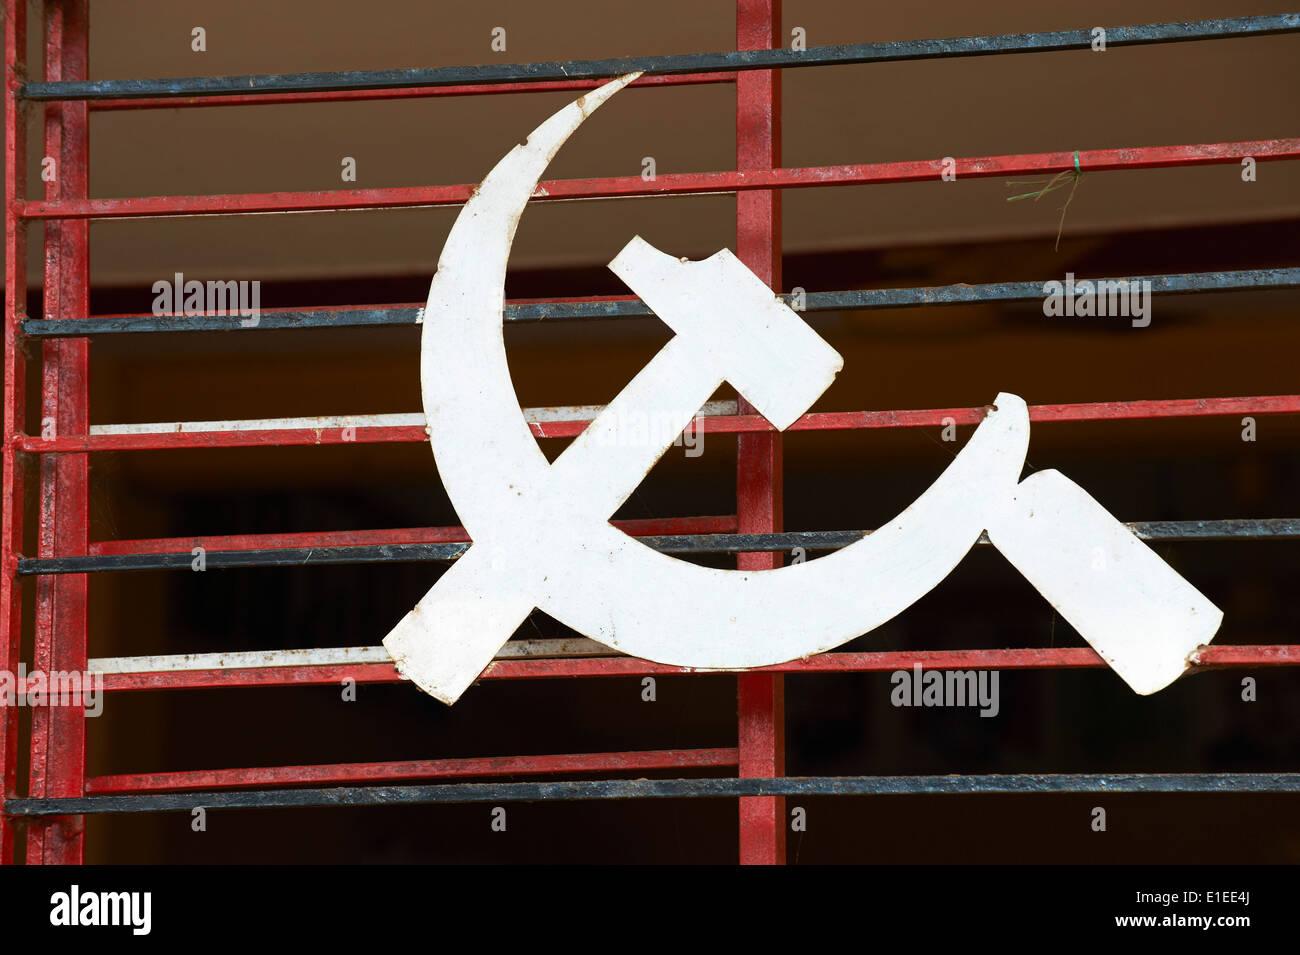 Kerala communist party stock photos kerala communist party stock india kerala state calicut or kozhikode communist party stock image biocorpaavc